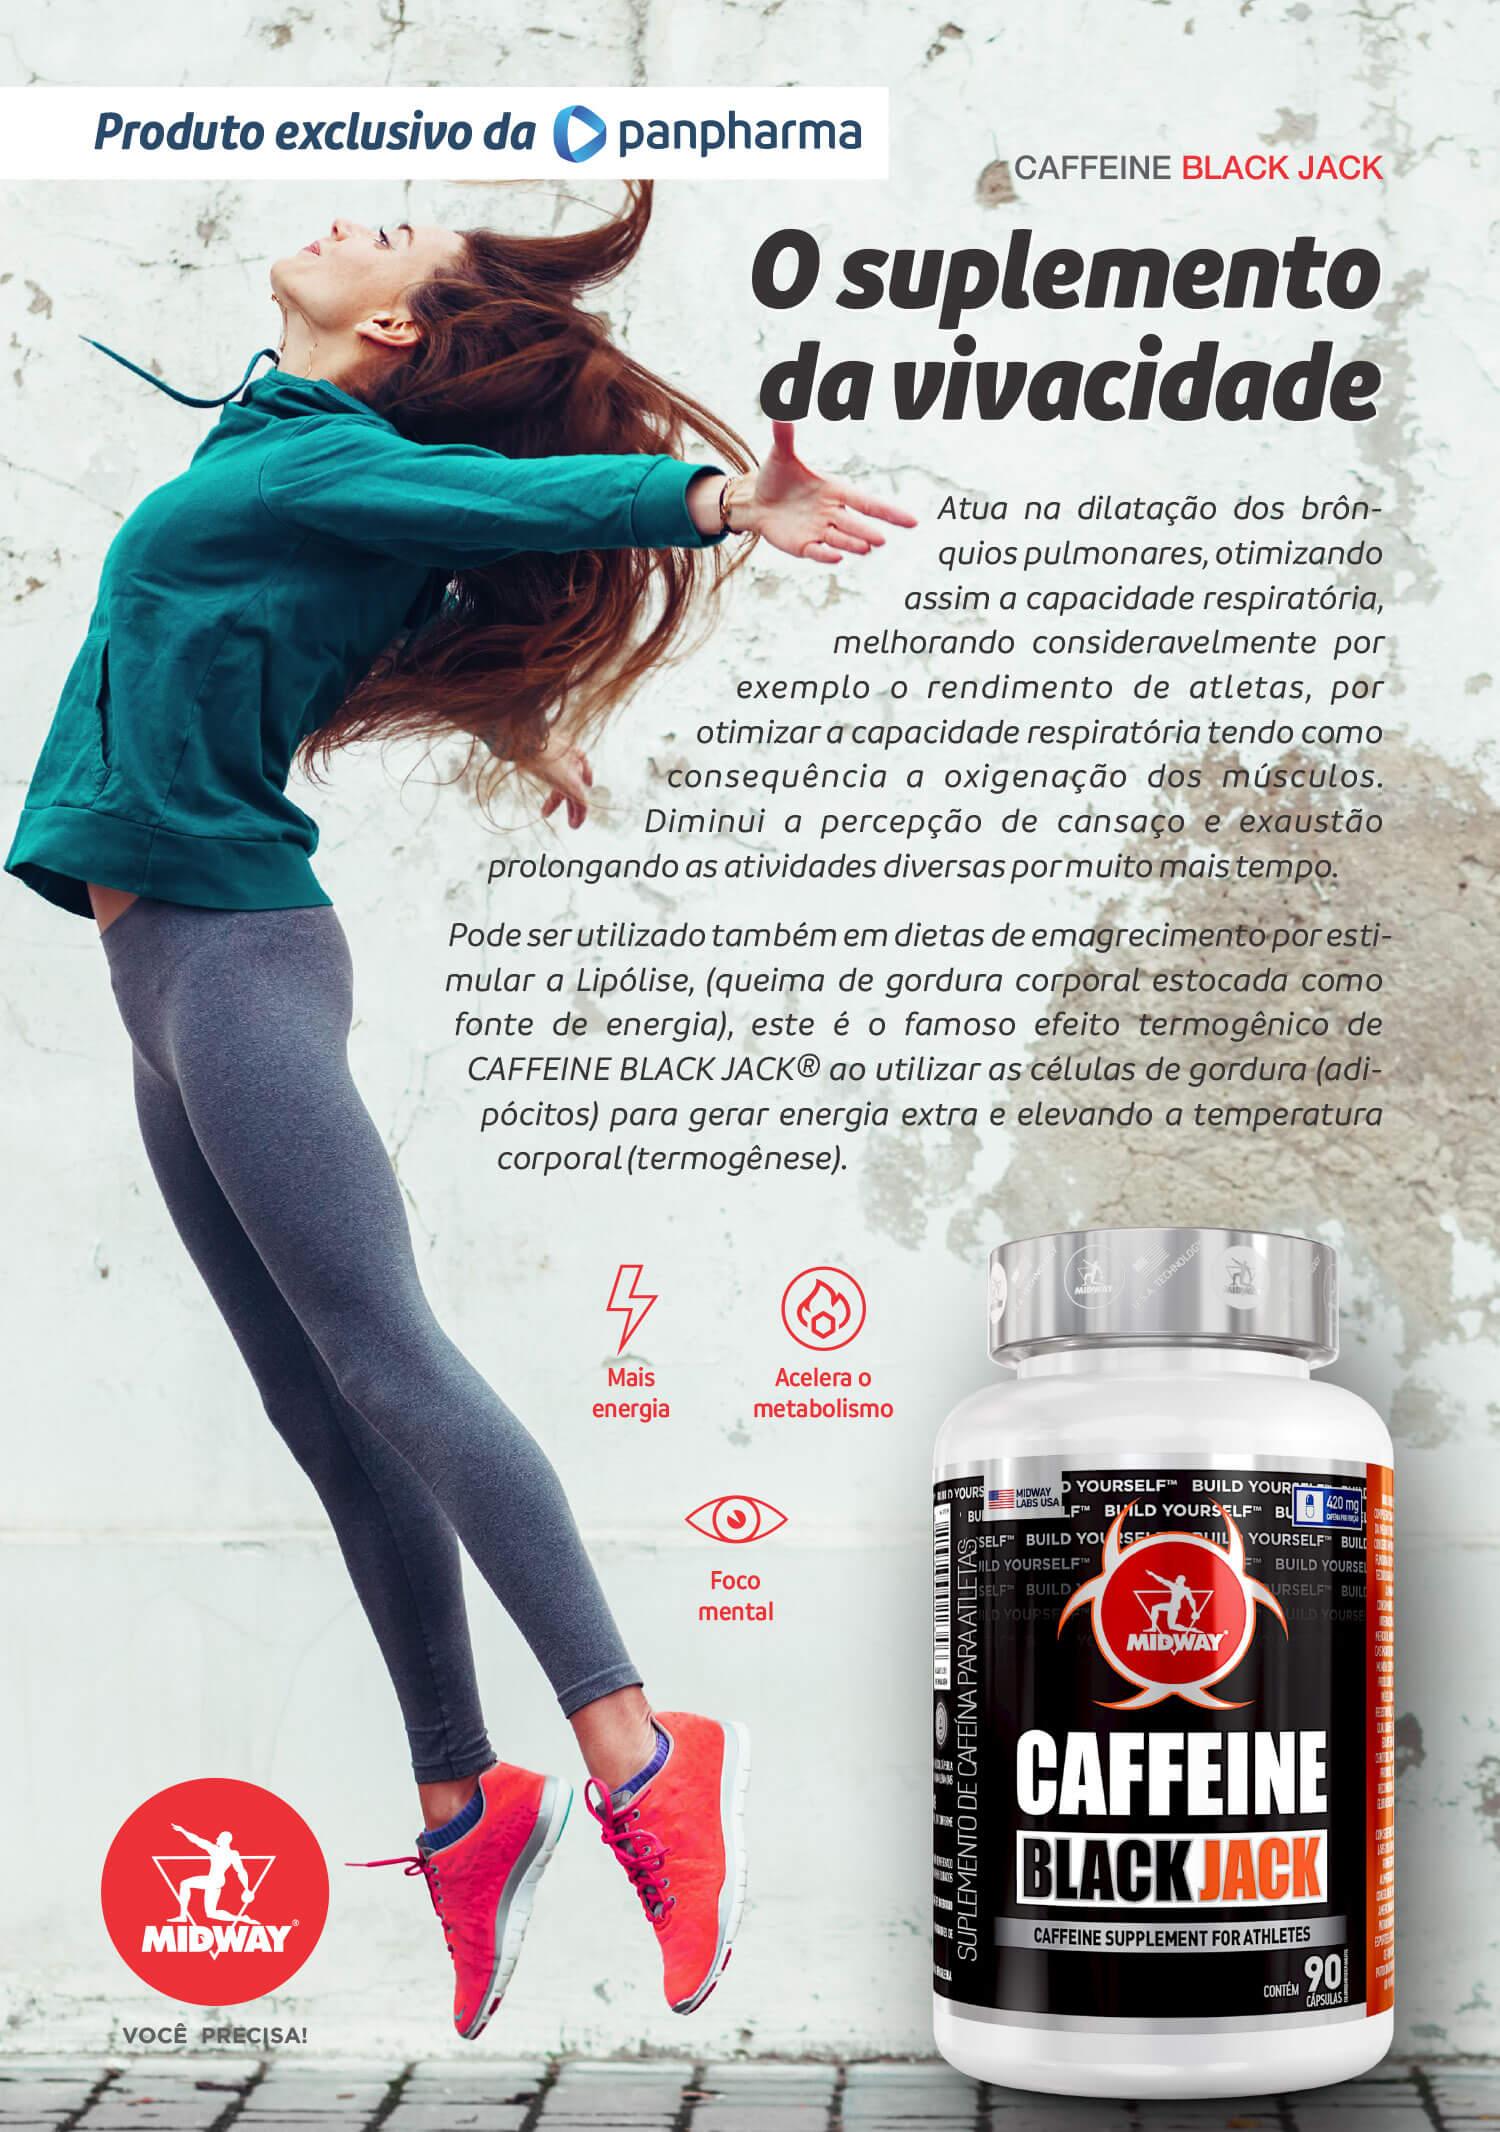 Caffeine Black Jack